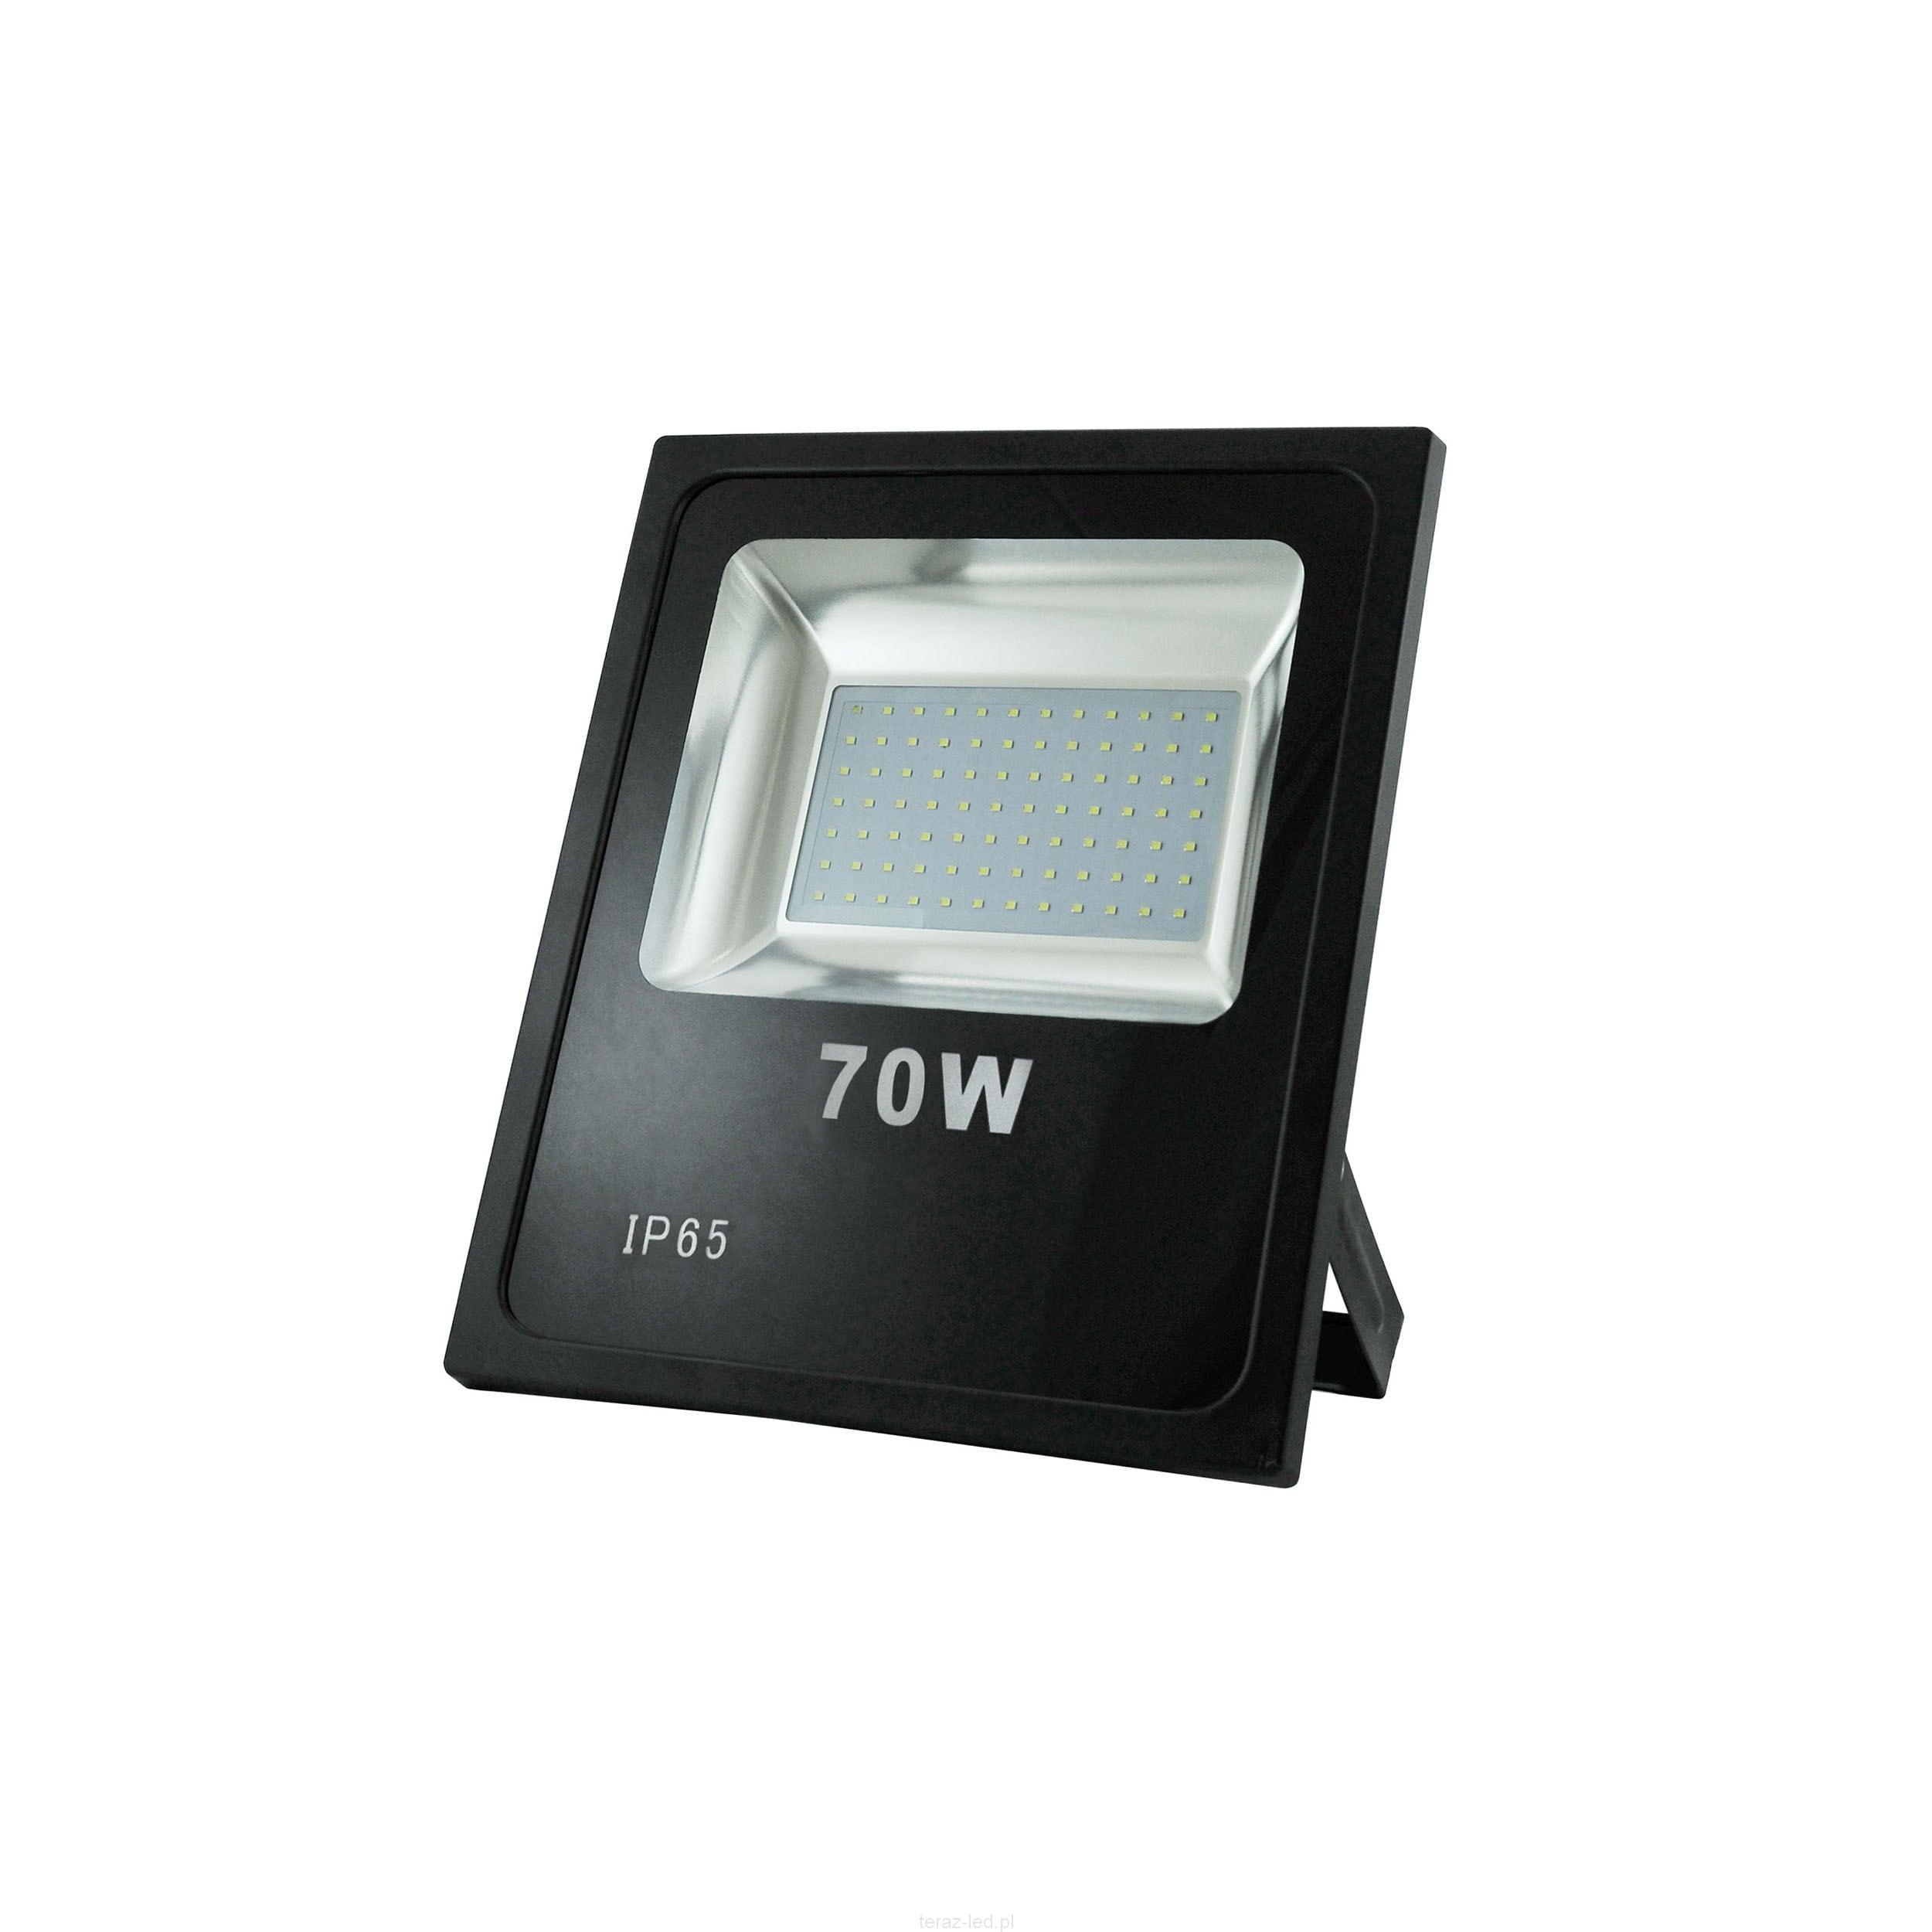 Projector LED floodlight 70W IP65 6400K Cold Color